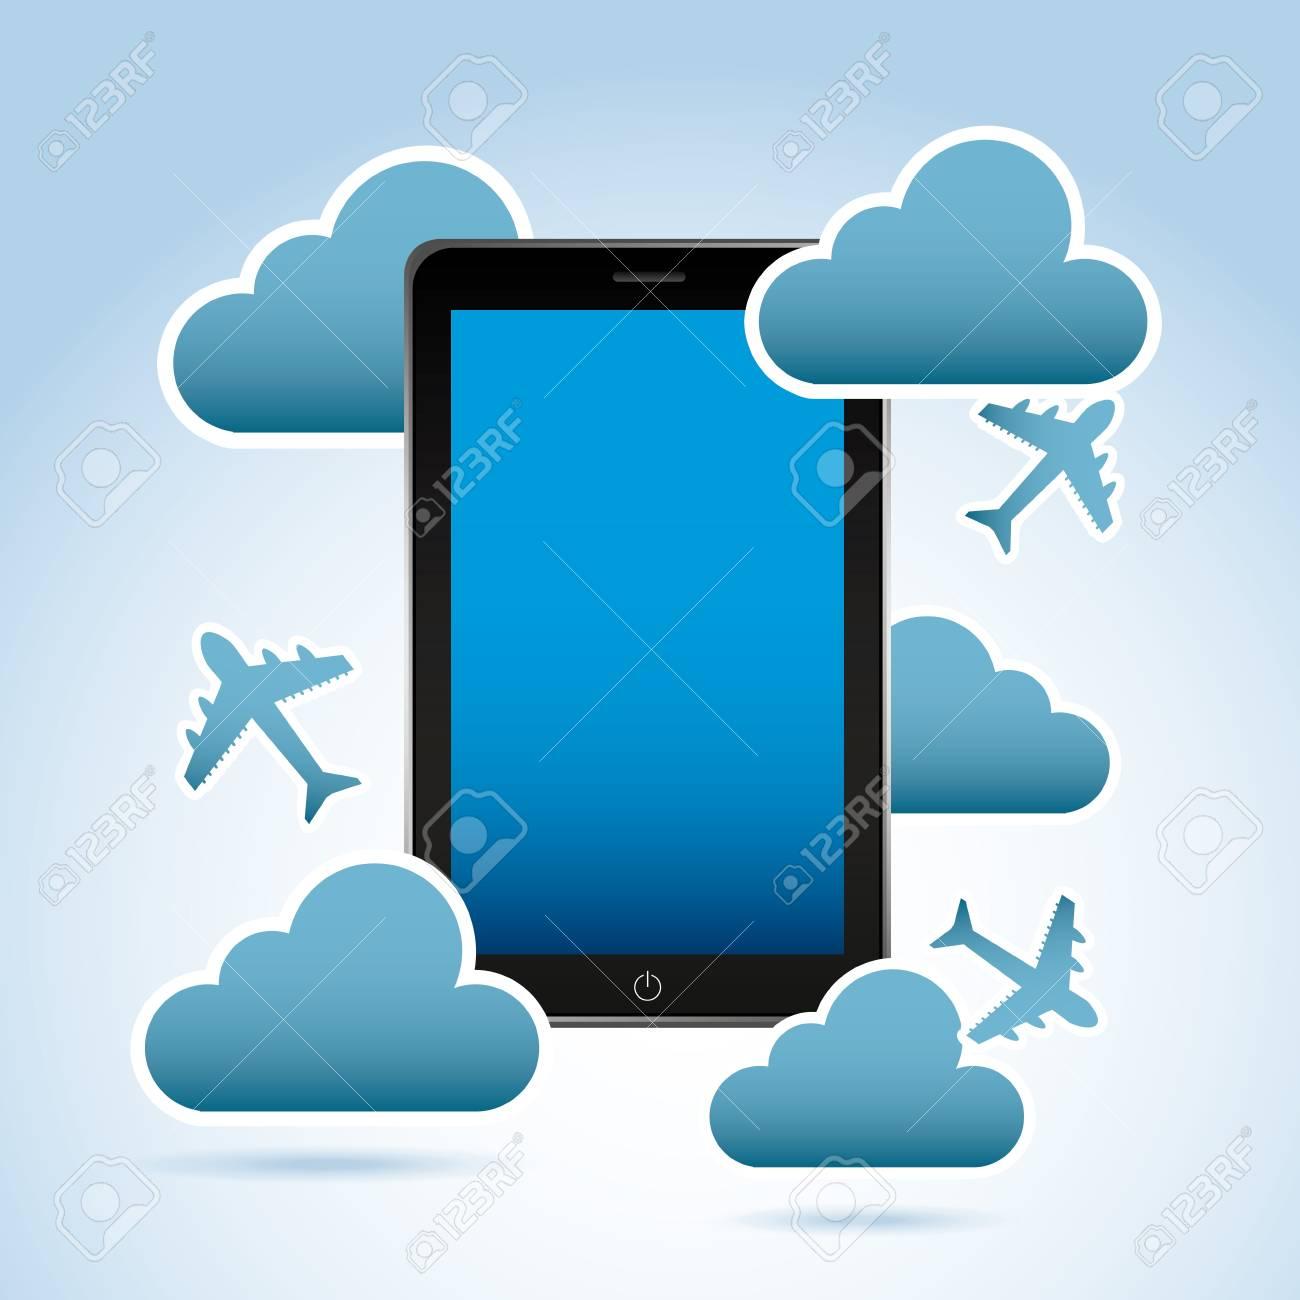 smart phone   over blue light background vector illustration Stock Vector - 20040872